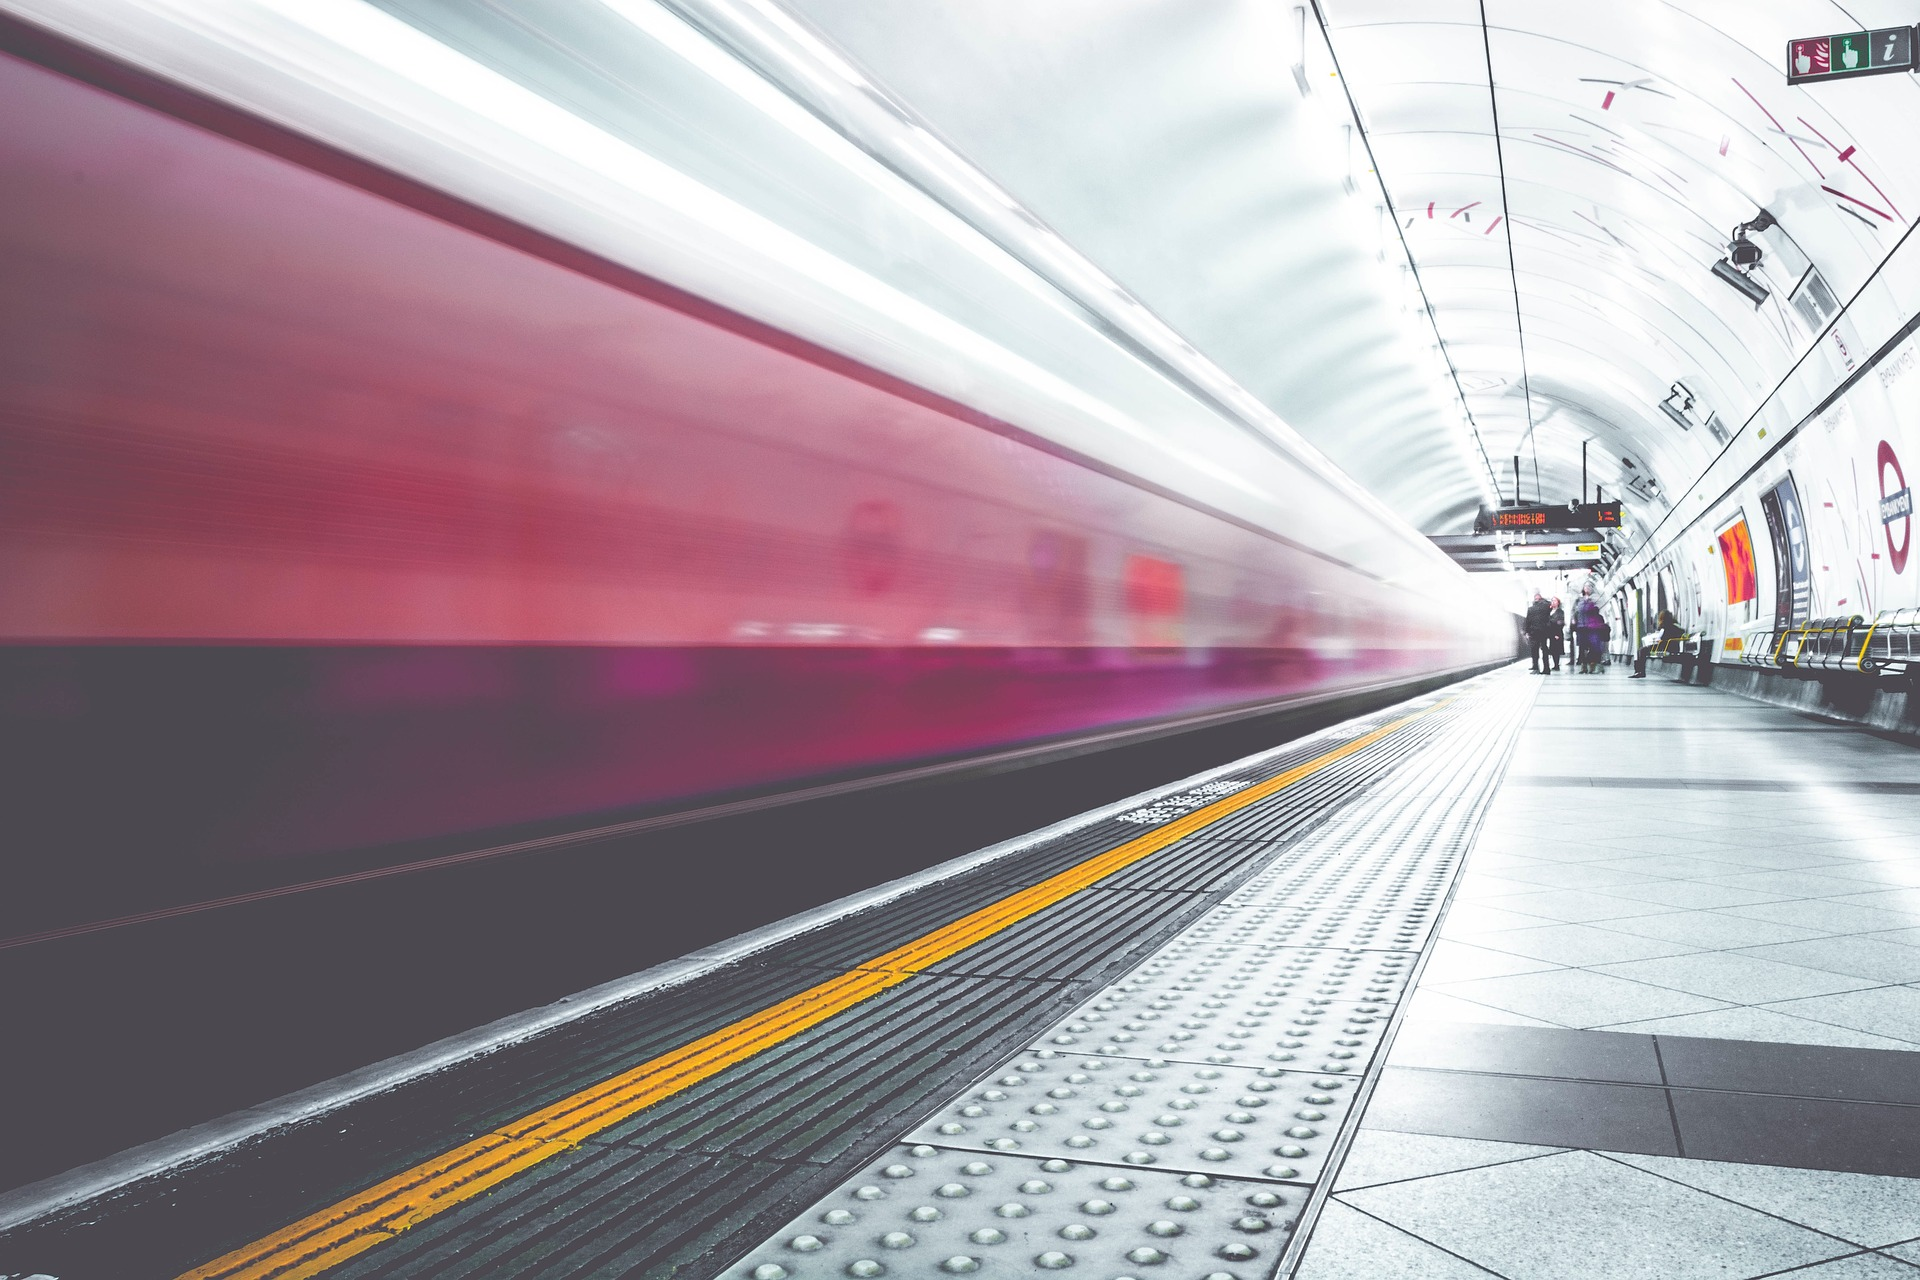 Warsaw receives EU funds for metro expansion (Poland)